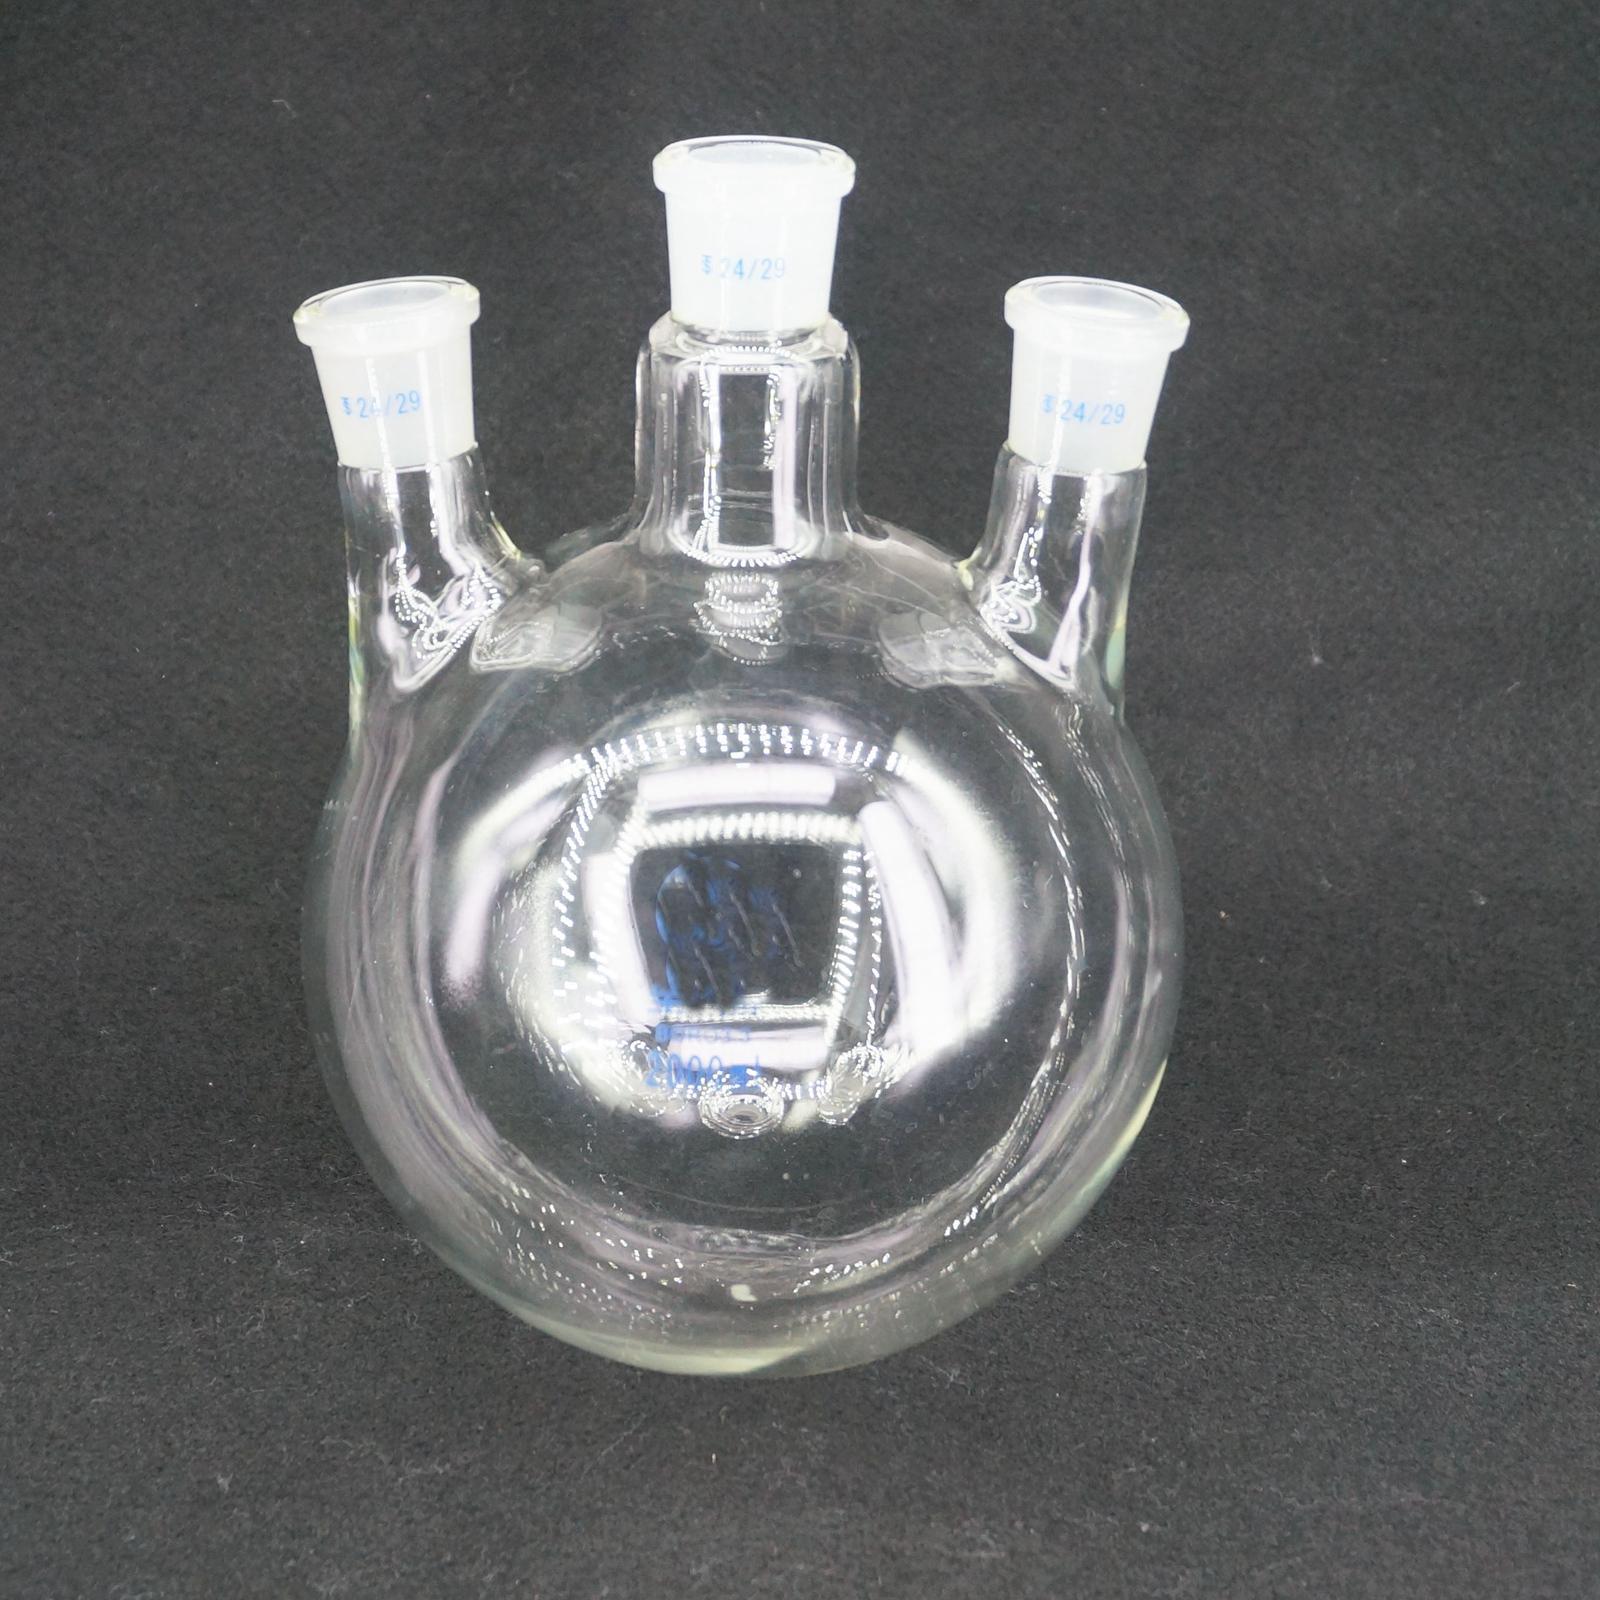 2000ml Laboratory Borosilicate Glass 24/29 Joint Glass Flask round bottom with Vertical 3-Neck цена и фото